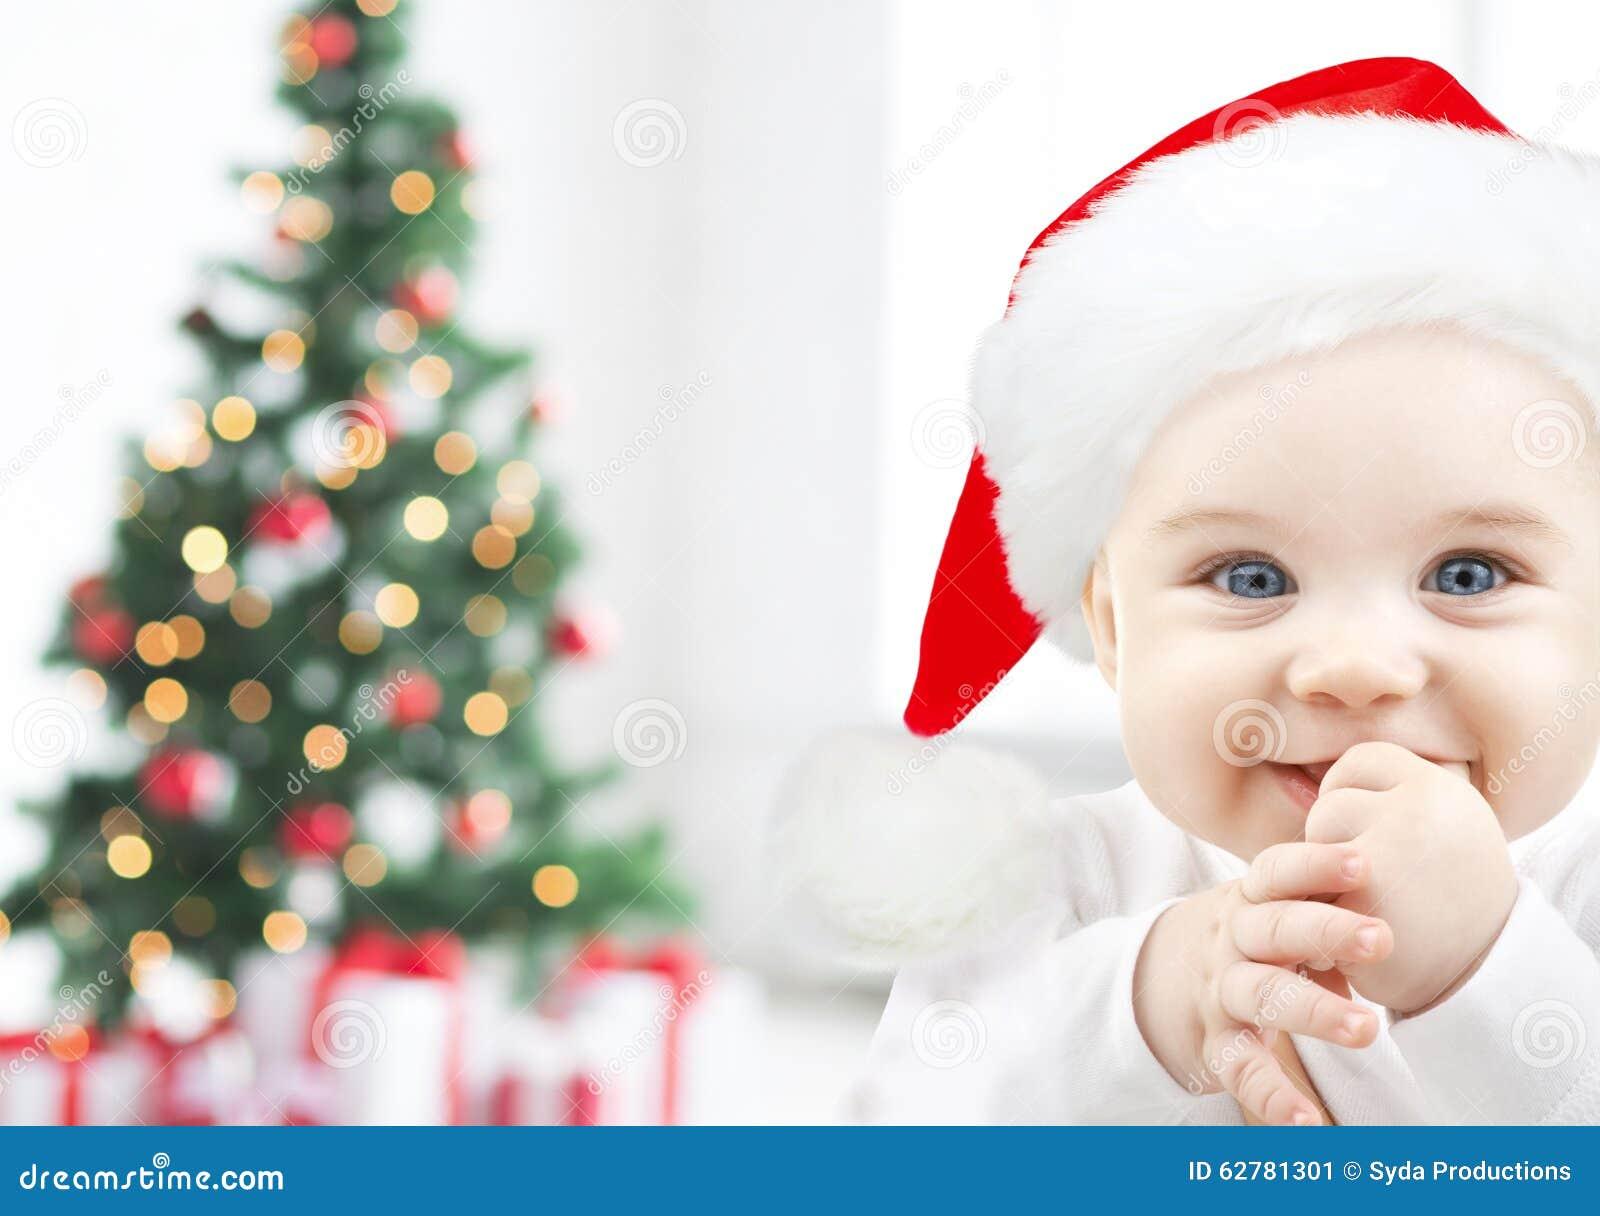 Happy Baby In Santa Hat Over Christmas Tree Lights Stock